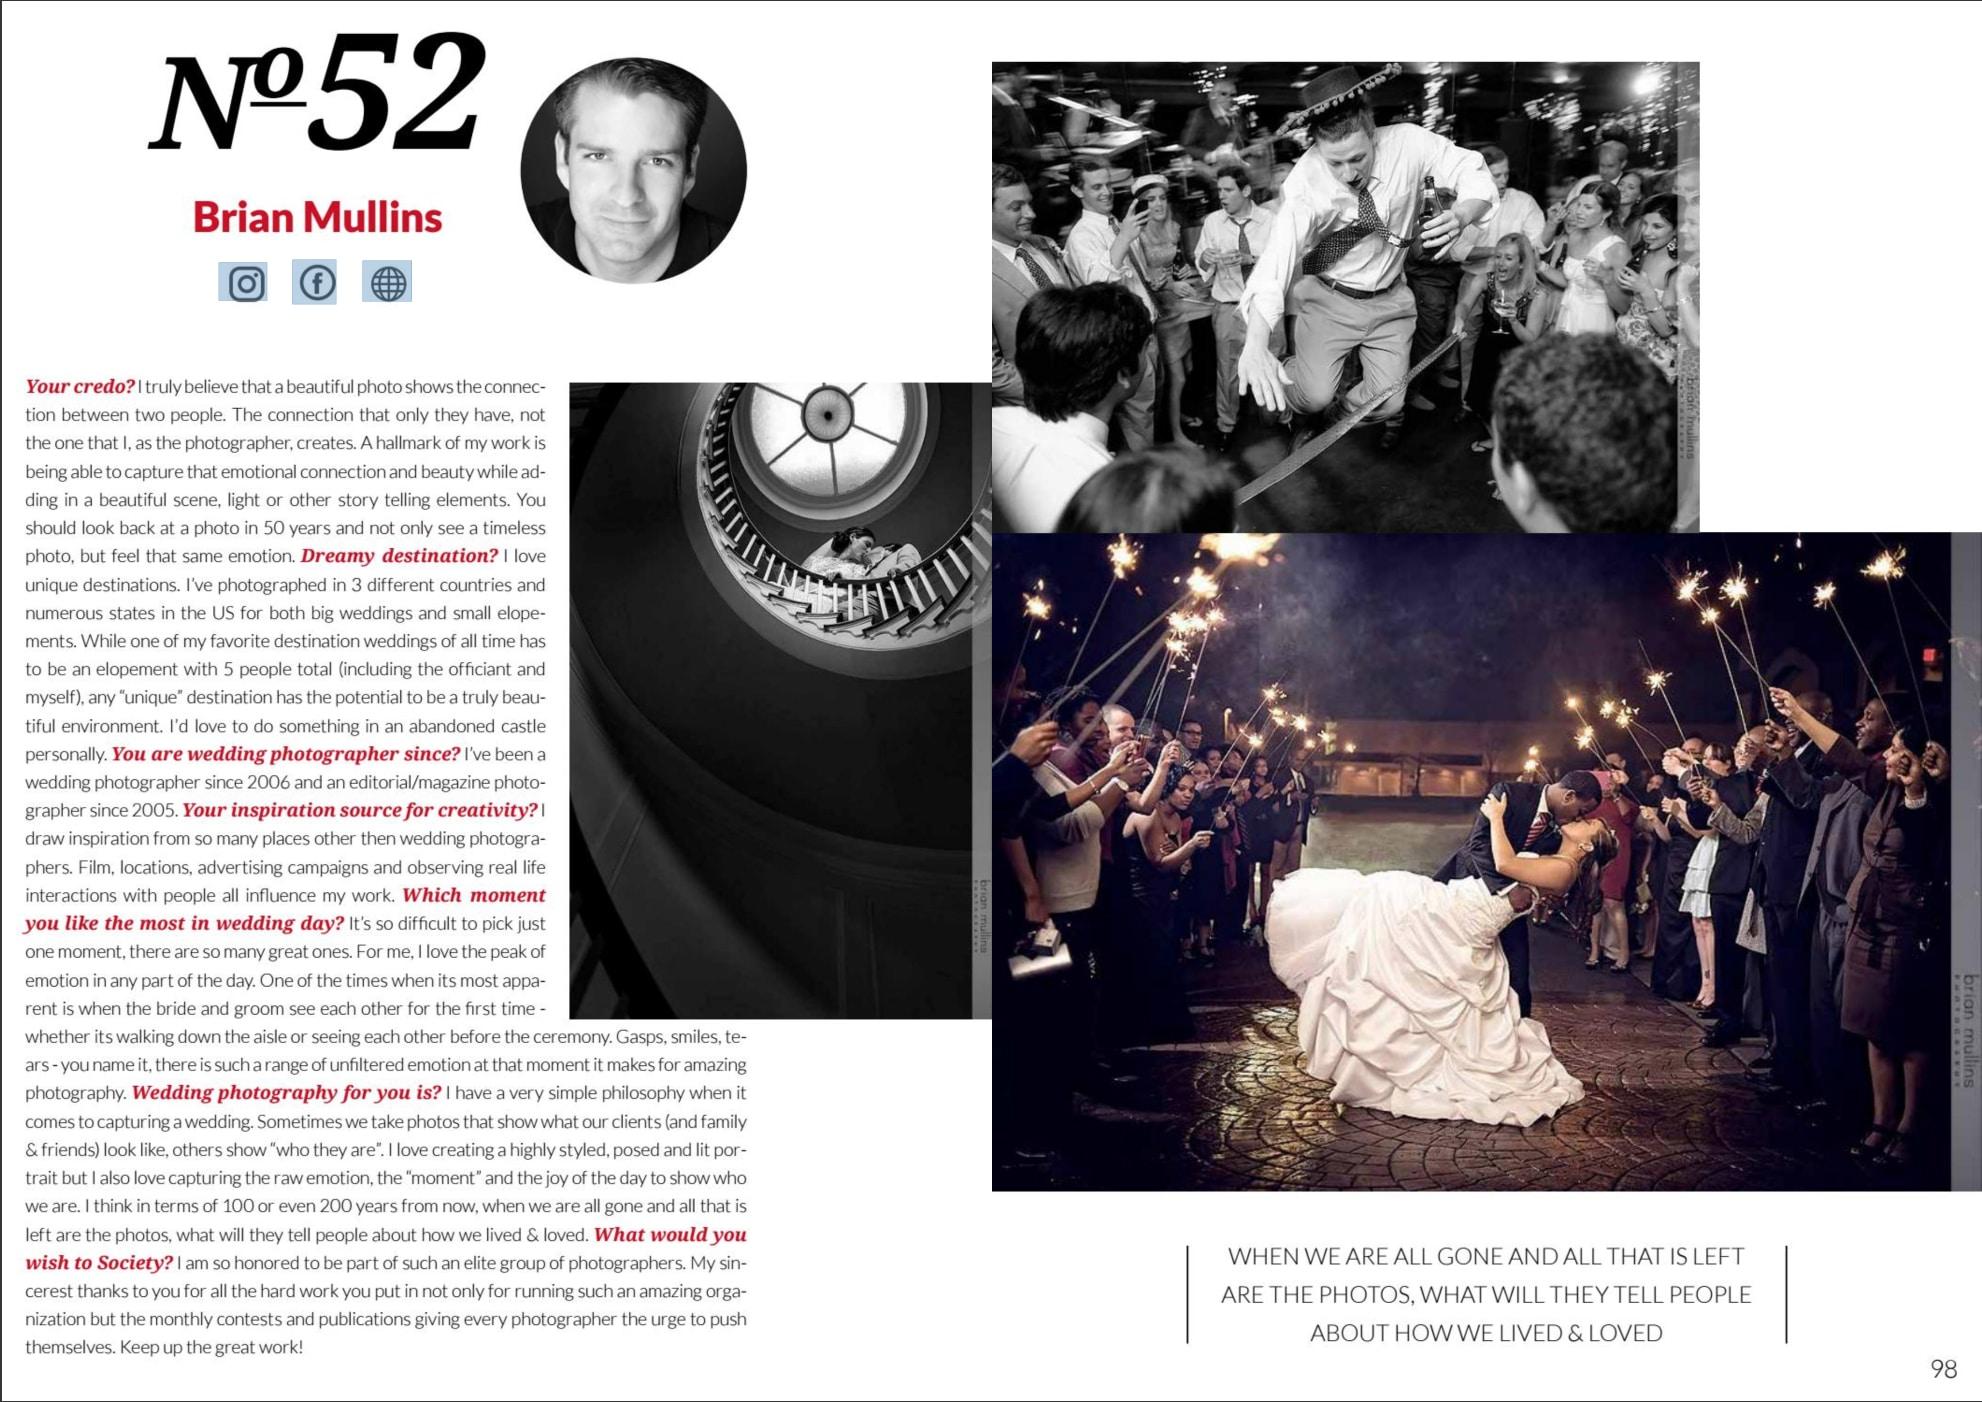 #52 wedding photographer in the world